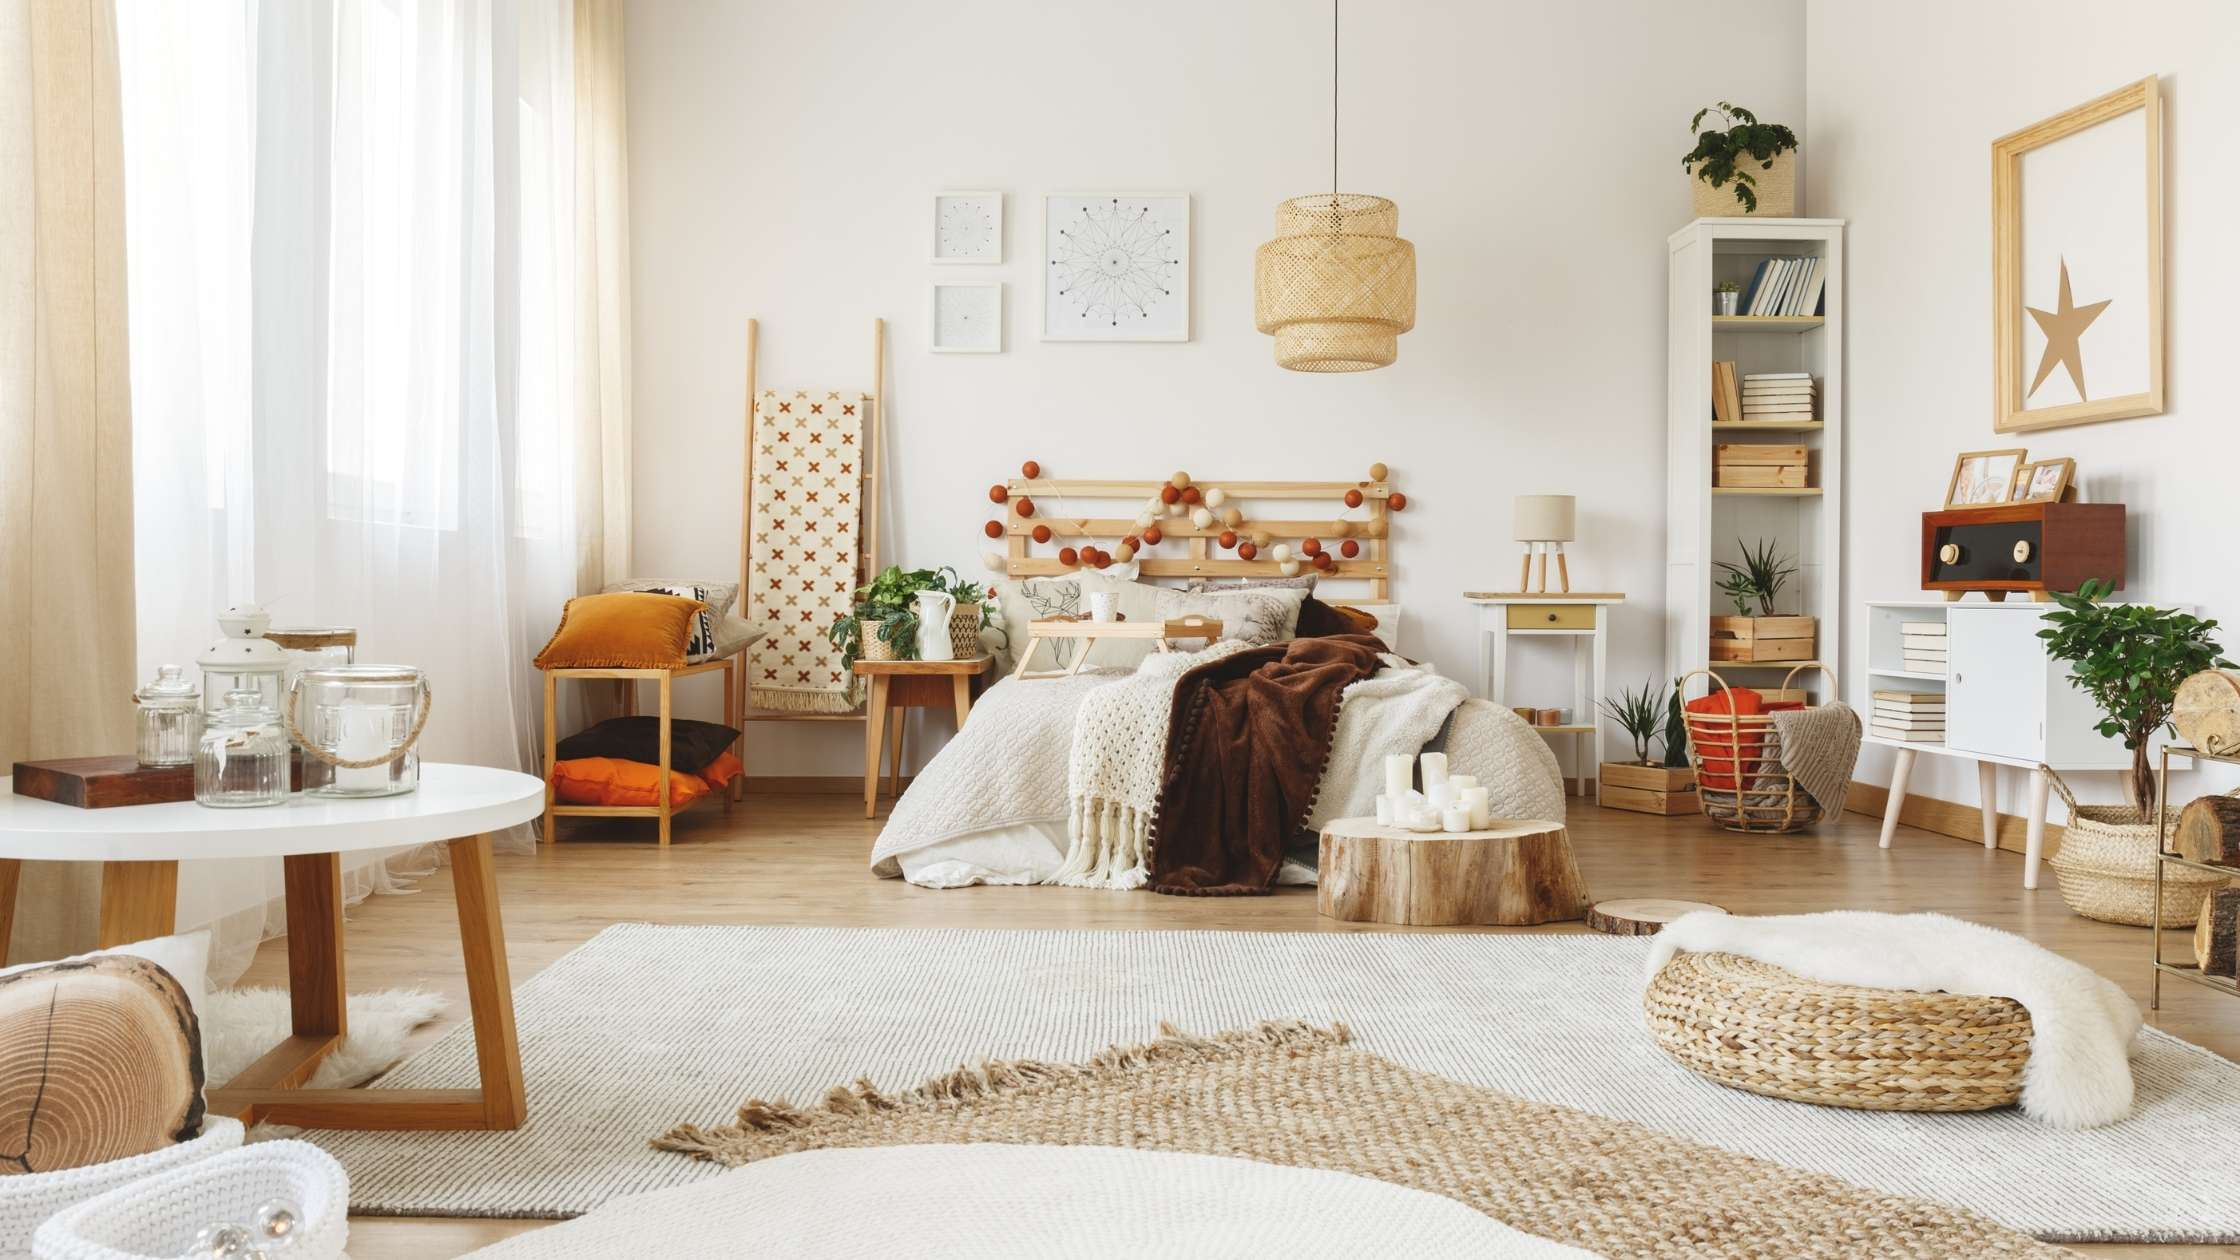 vloerkleed in slaapkamer